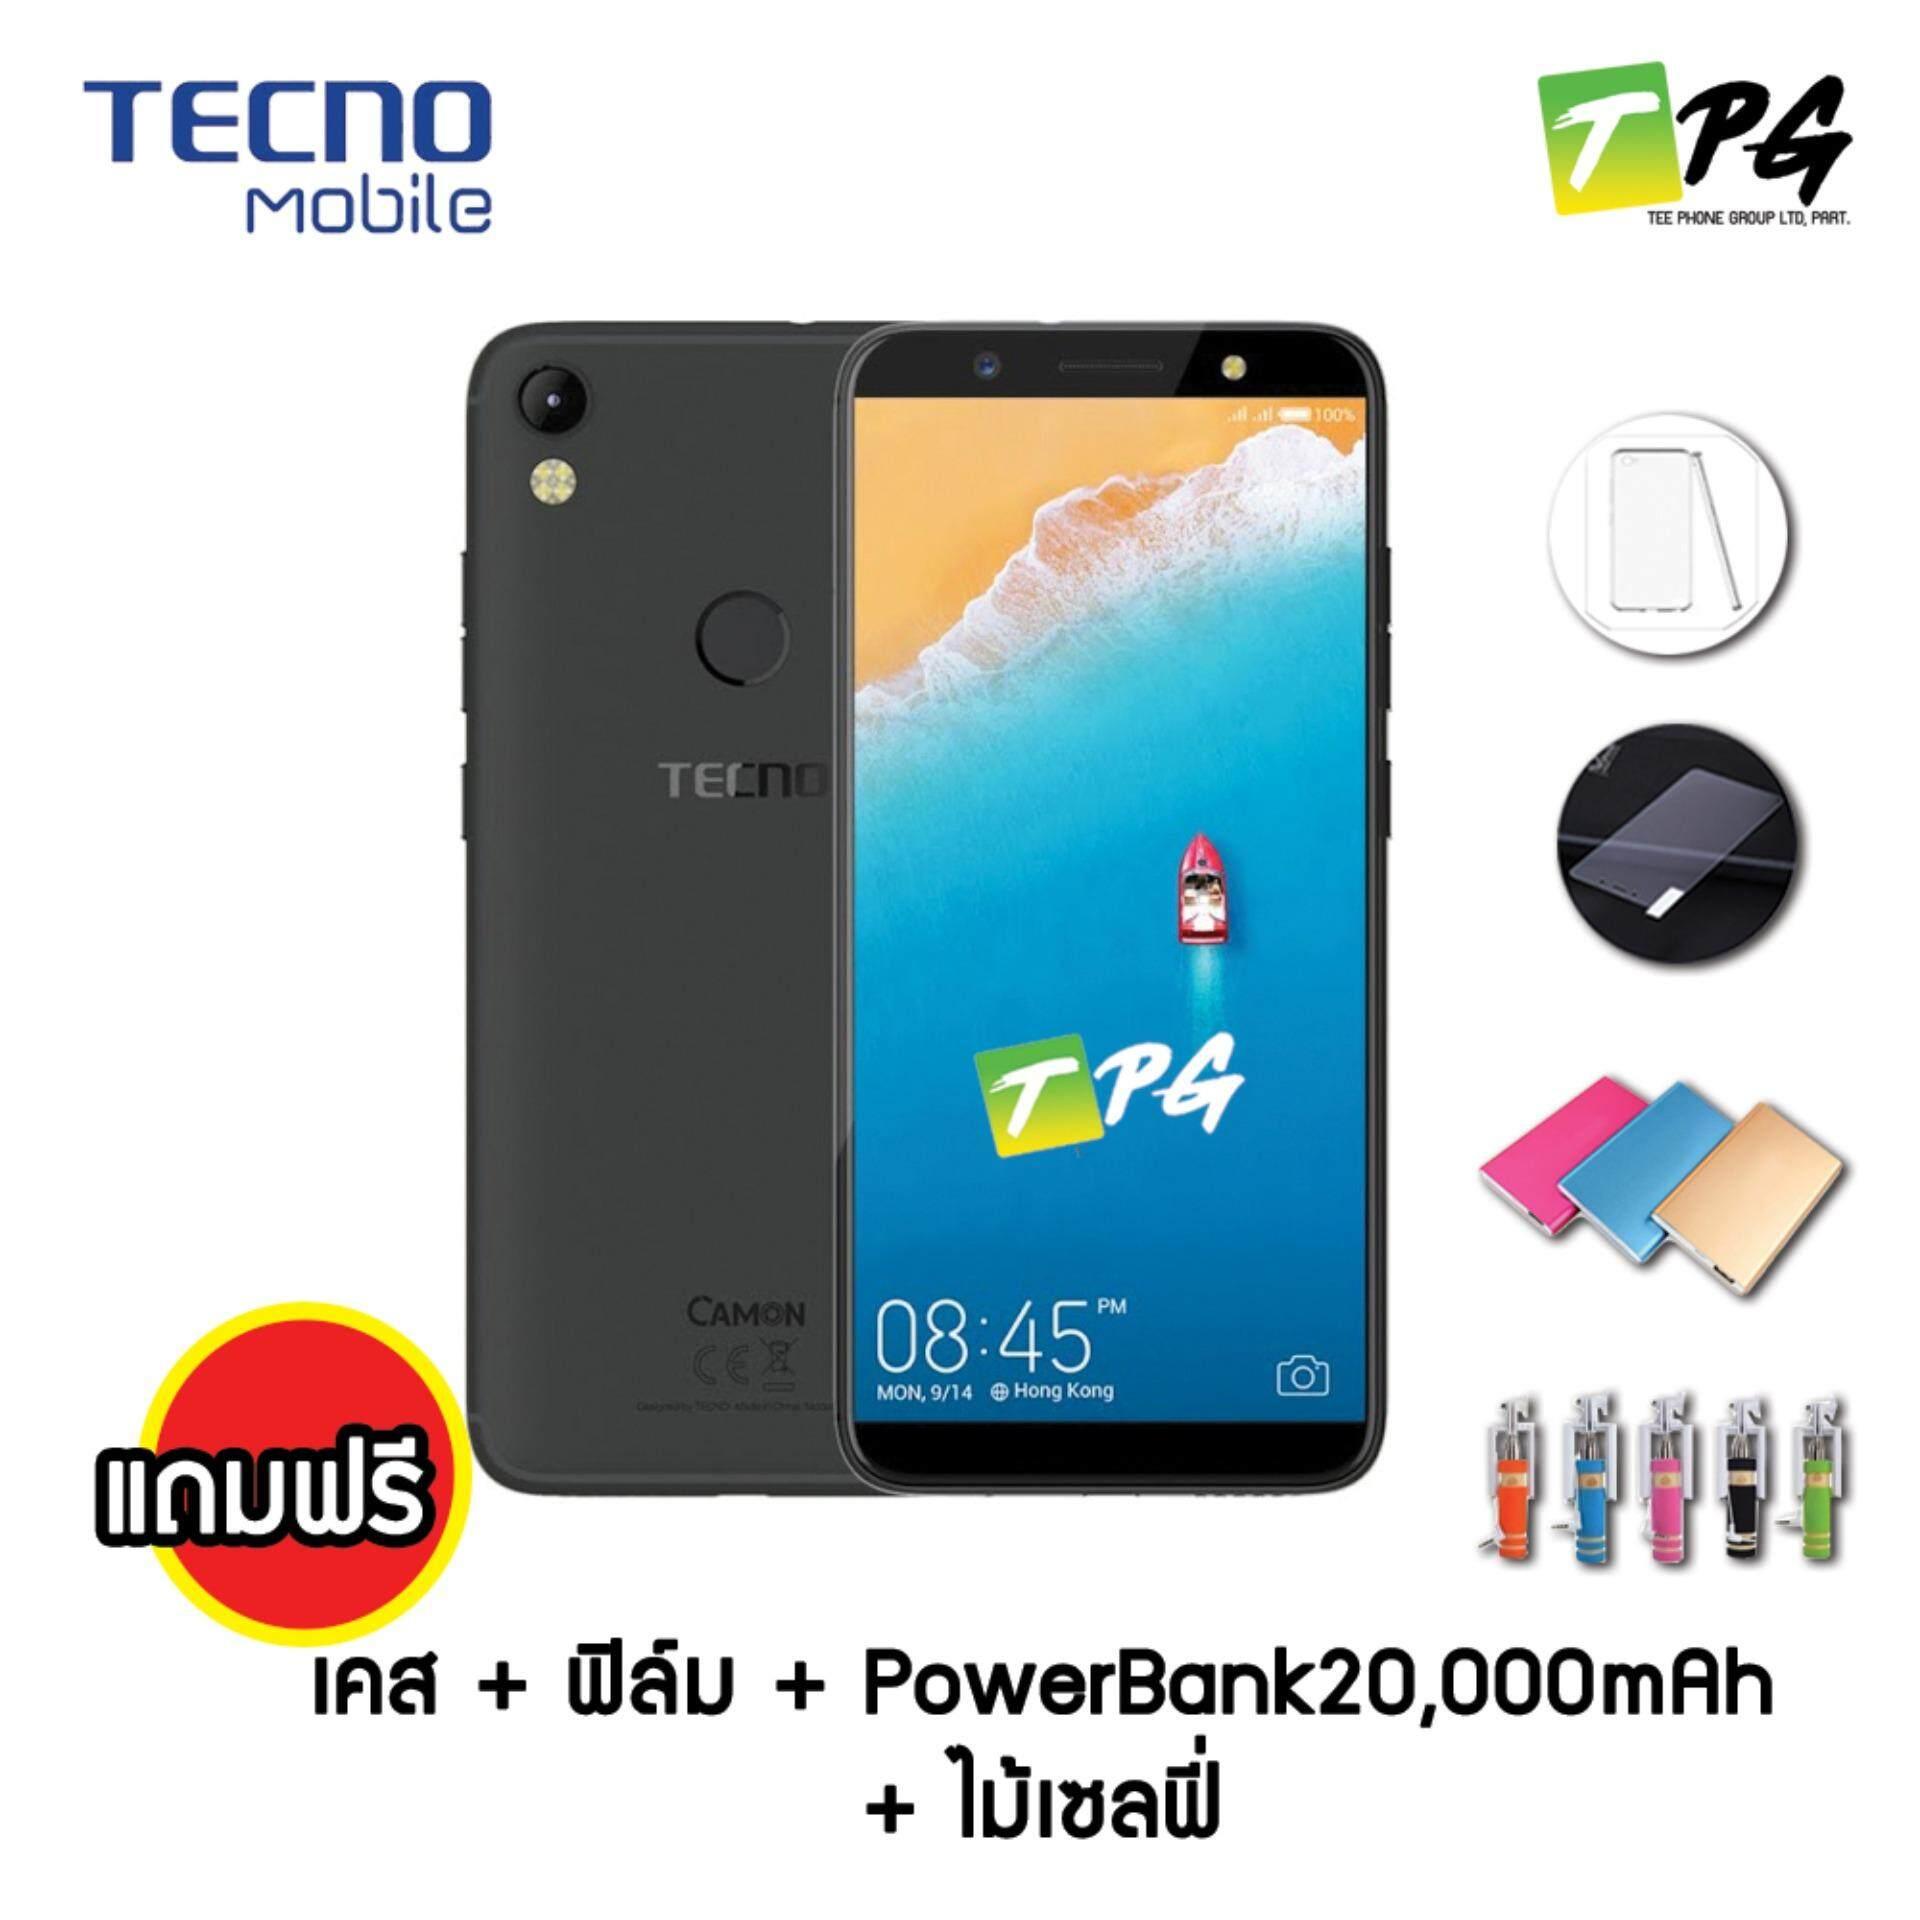 TECNO CAMON CM 2018 (3/32GB)ศูนย์ไทย สี Black เคส+ฟิล์ม+PowerBank20,000mAh+ไม้เซลฟี่